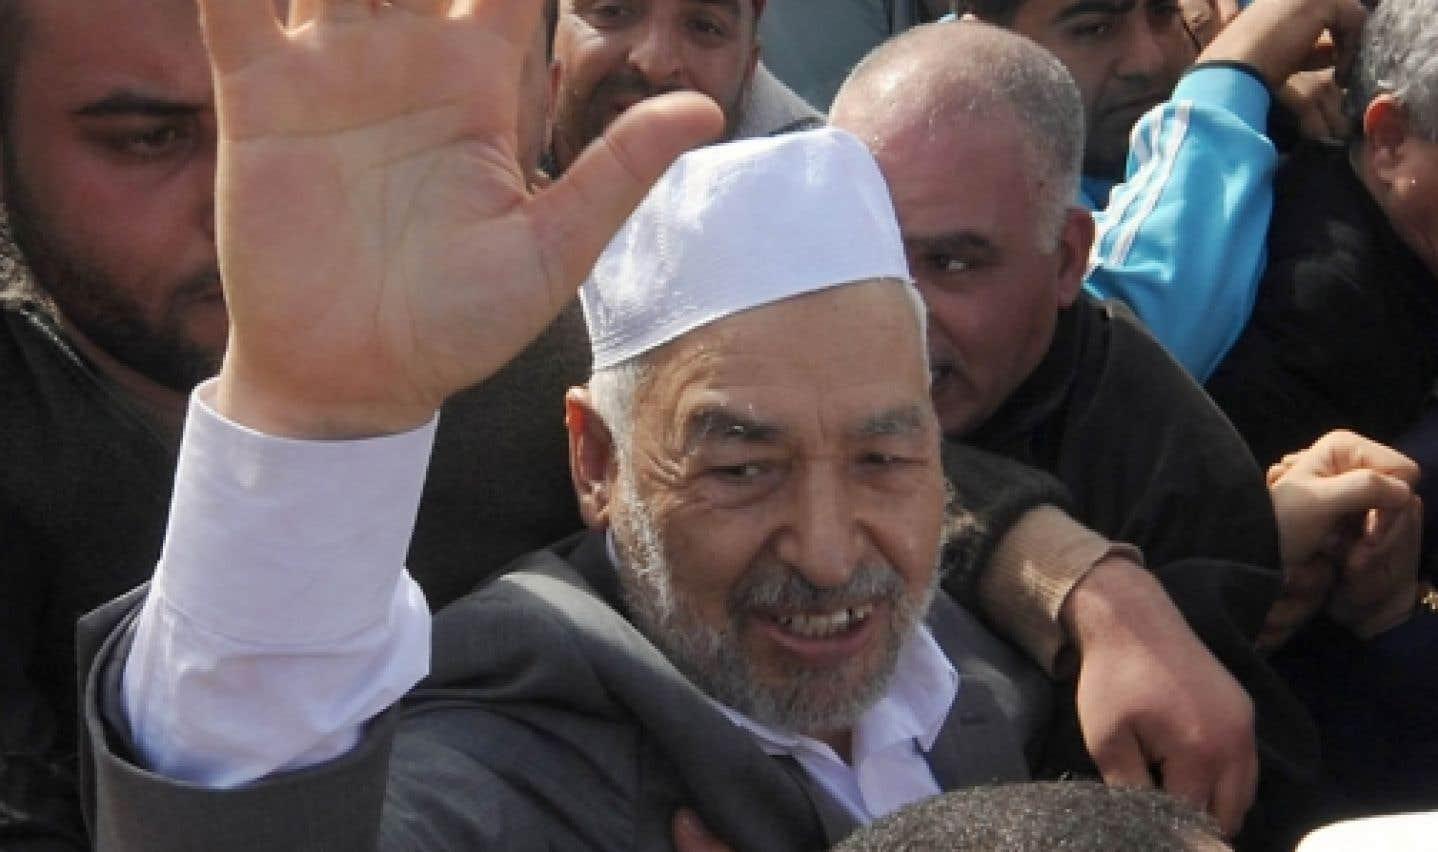 Tunisie - Ghannouchi ne sera pas candidat